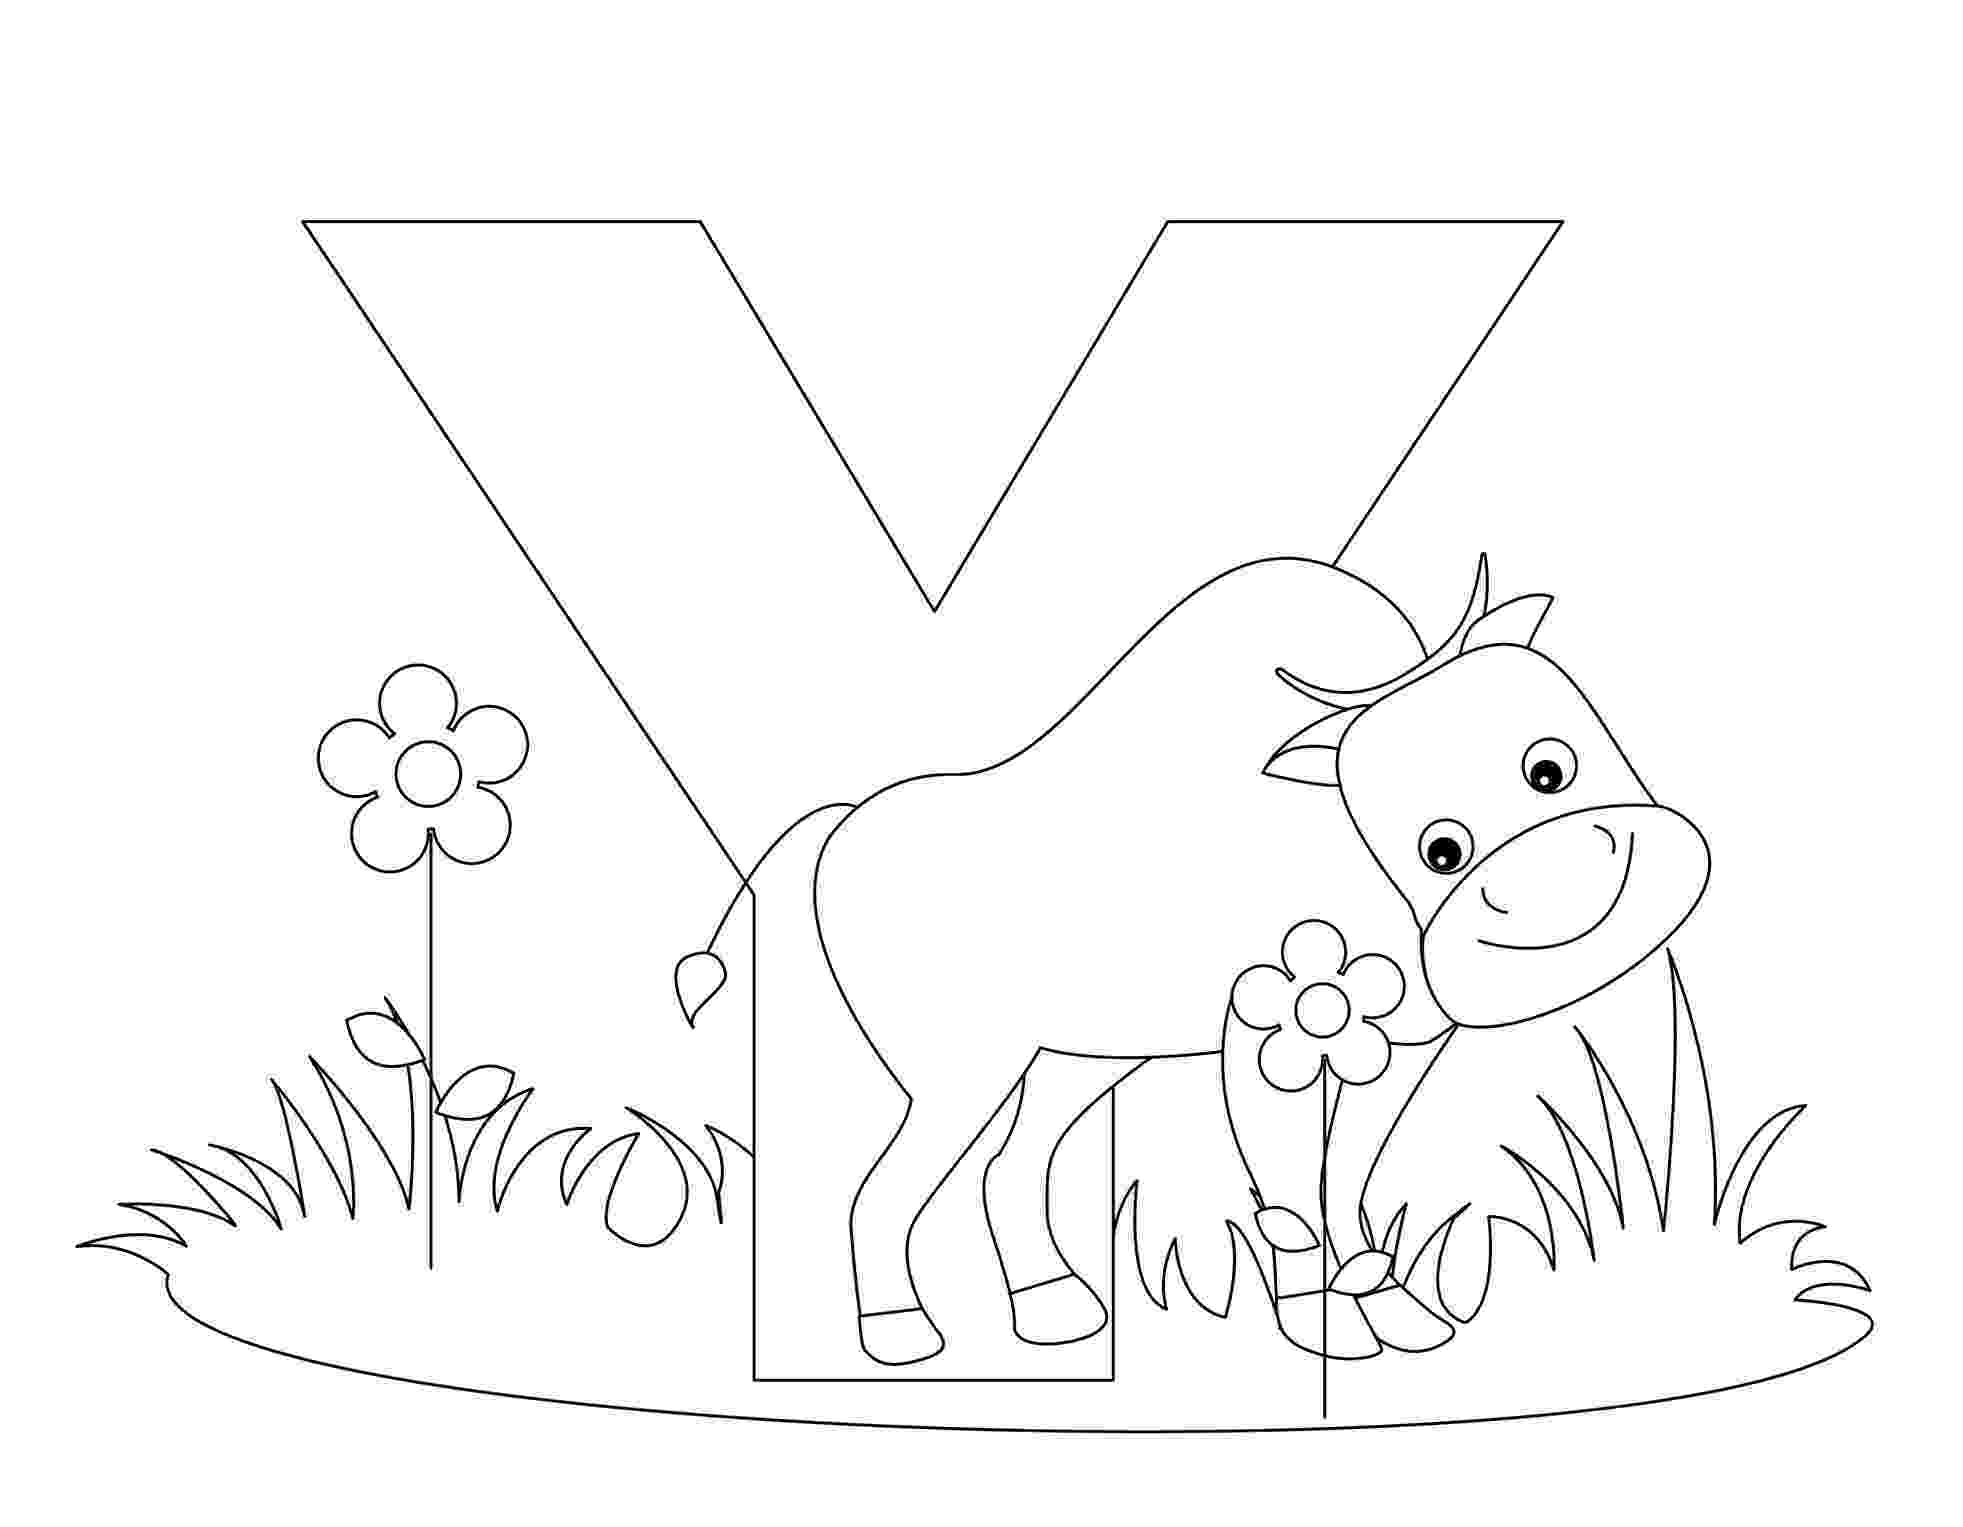 alphabet coloring free printable alphabet coloring pages for kids best alphabet coloring 1 6